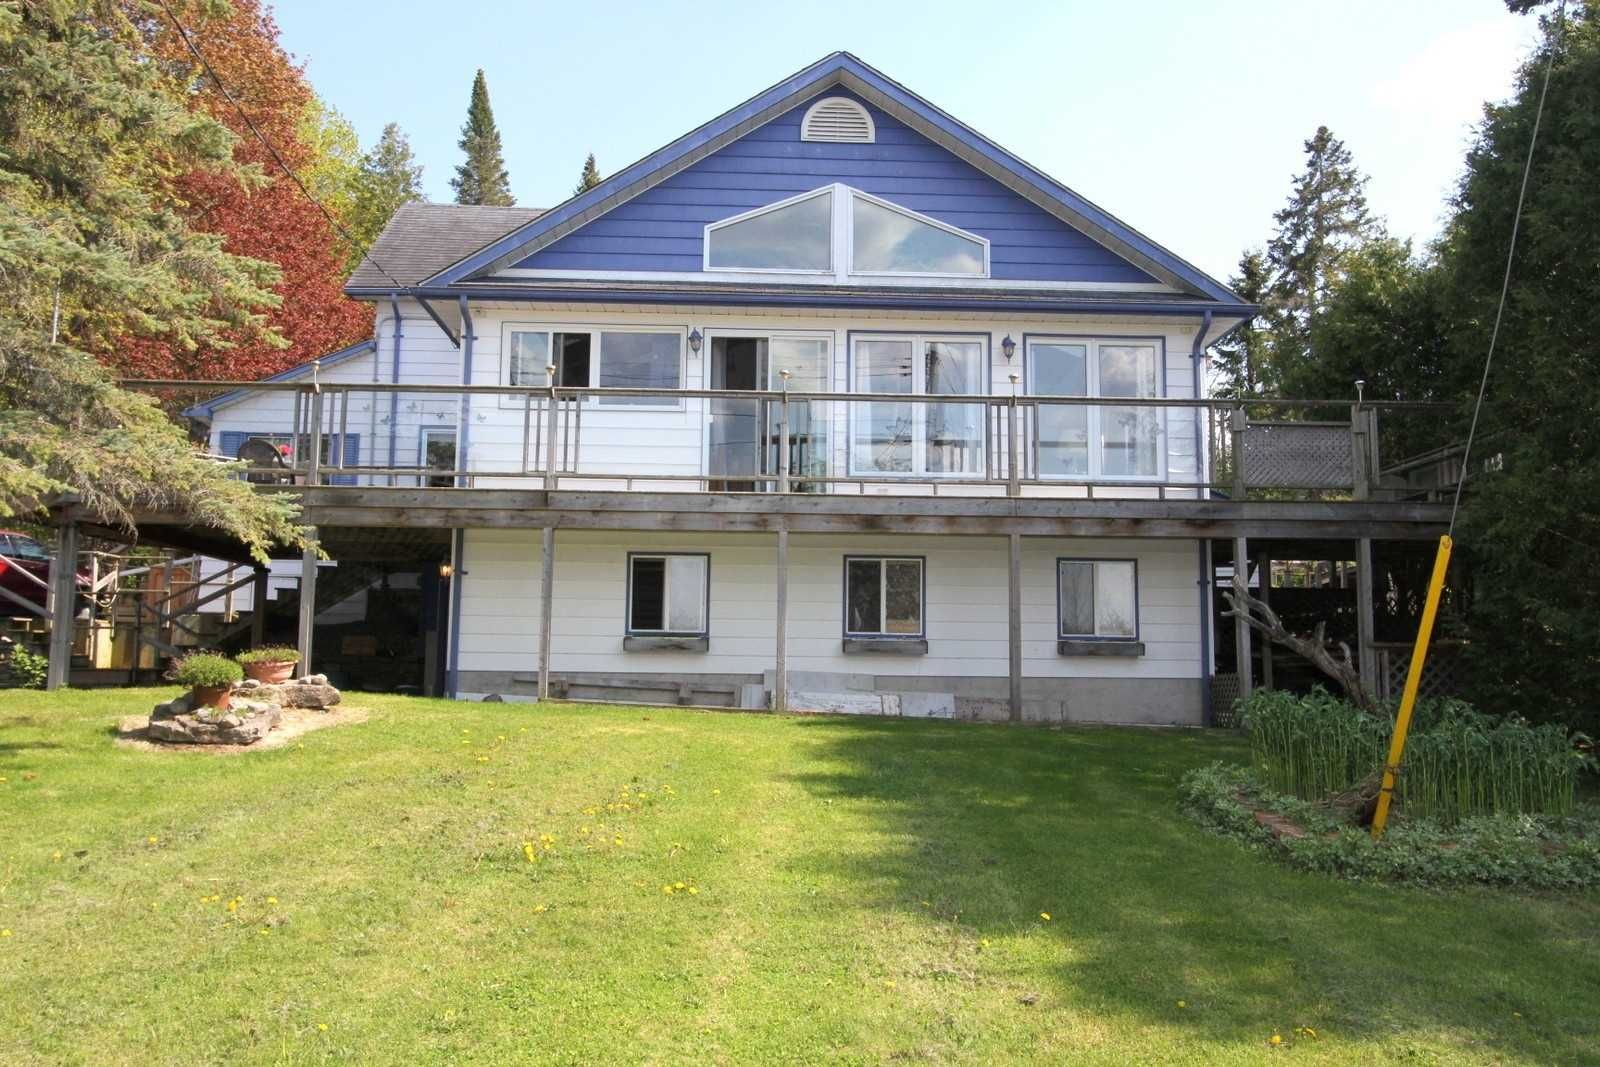 Main Photo: 15 Augusta Street in Kawartha Lakes: Dunsford House (1 1/2 Storey) for sale : MLS®# X5244386